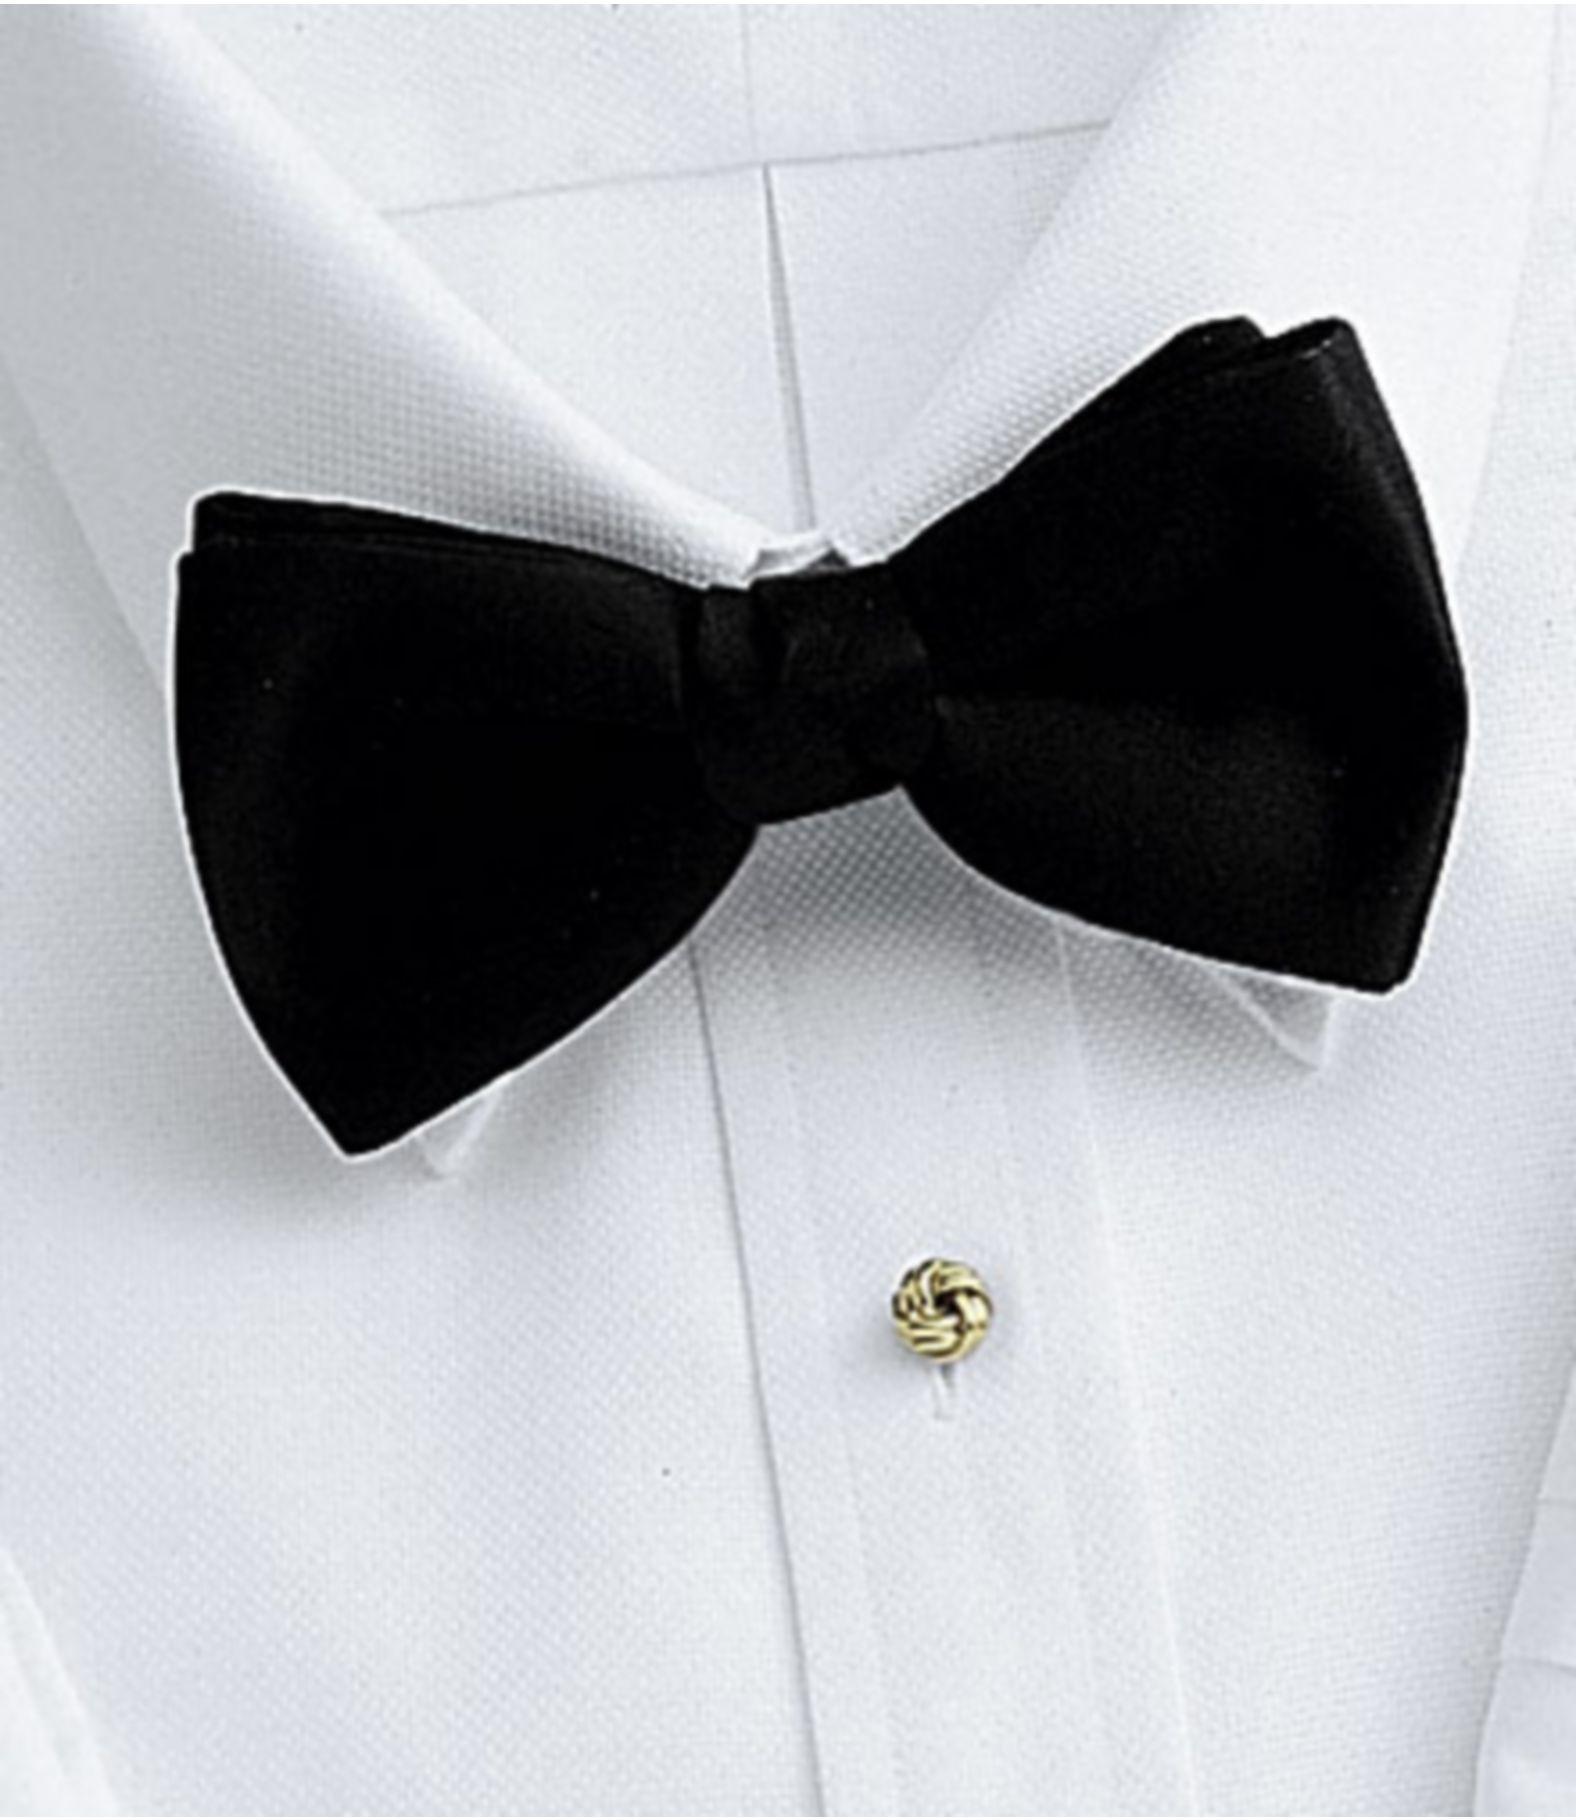 Pretie Black Bow Tie #8mrt